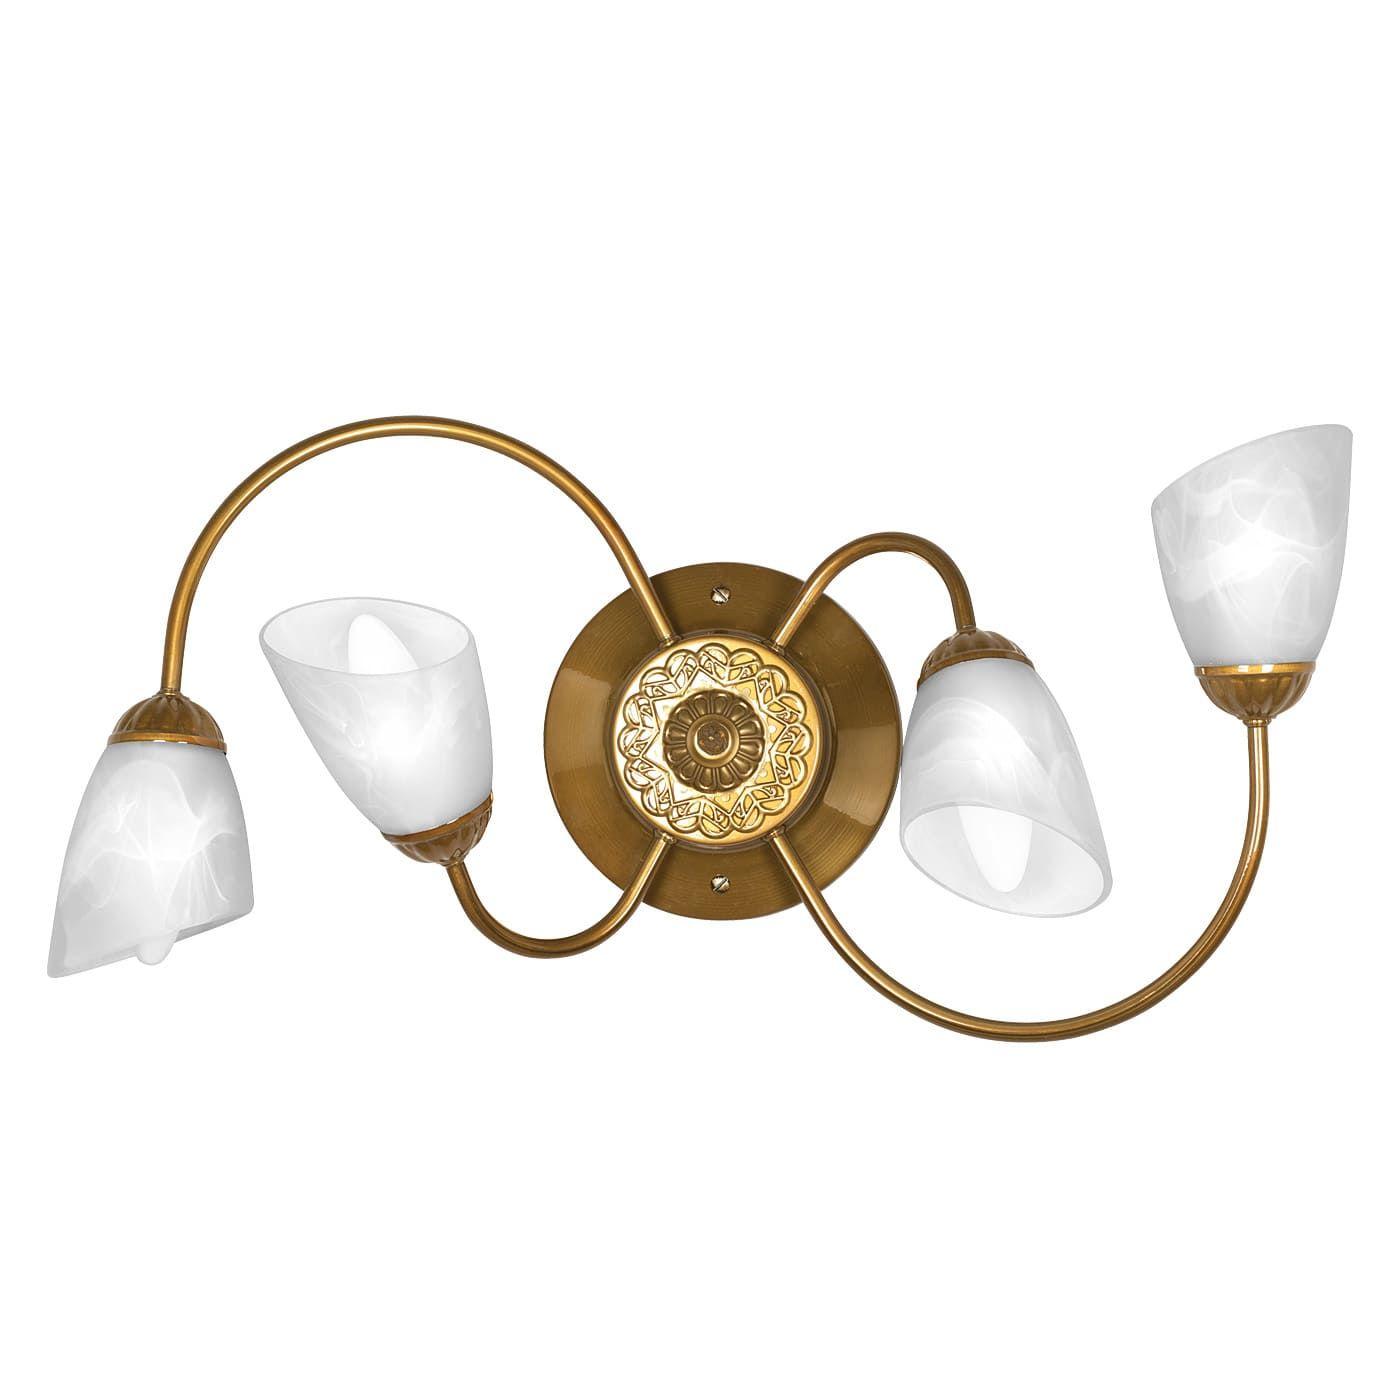 PETRASVET / Ceiling chandelier S2118-4, 4xE14 max. 60W